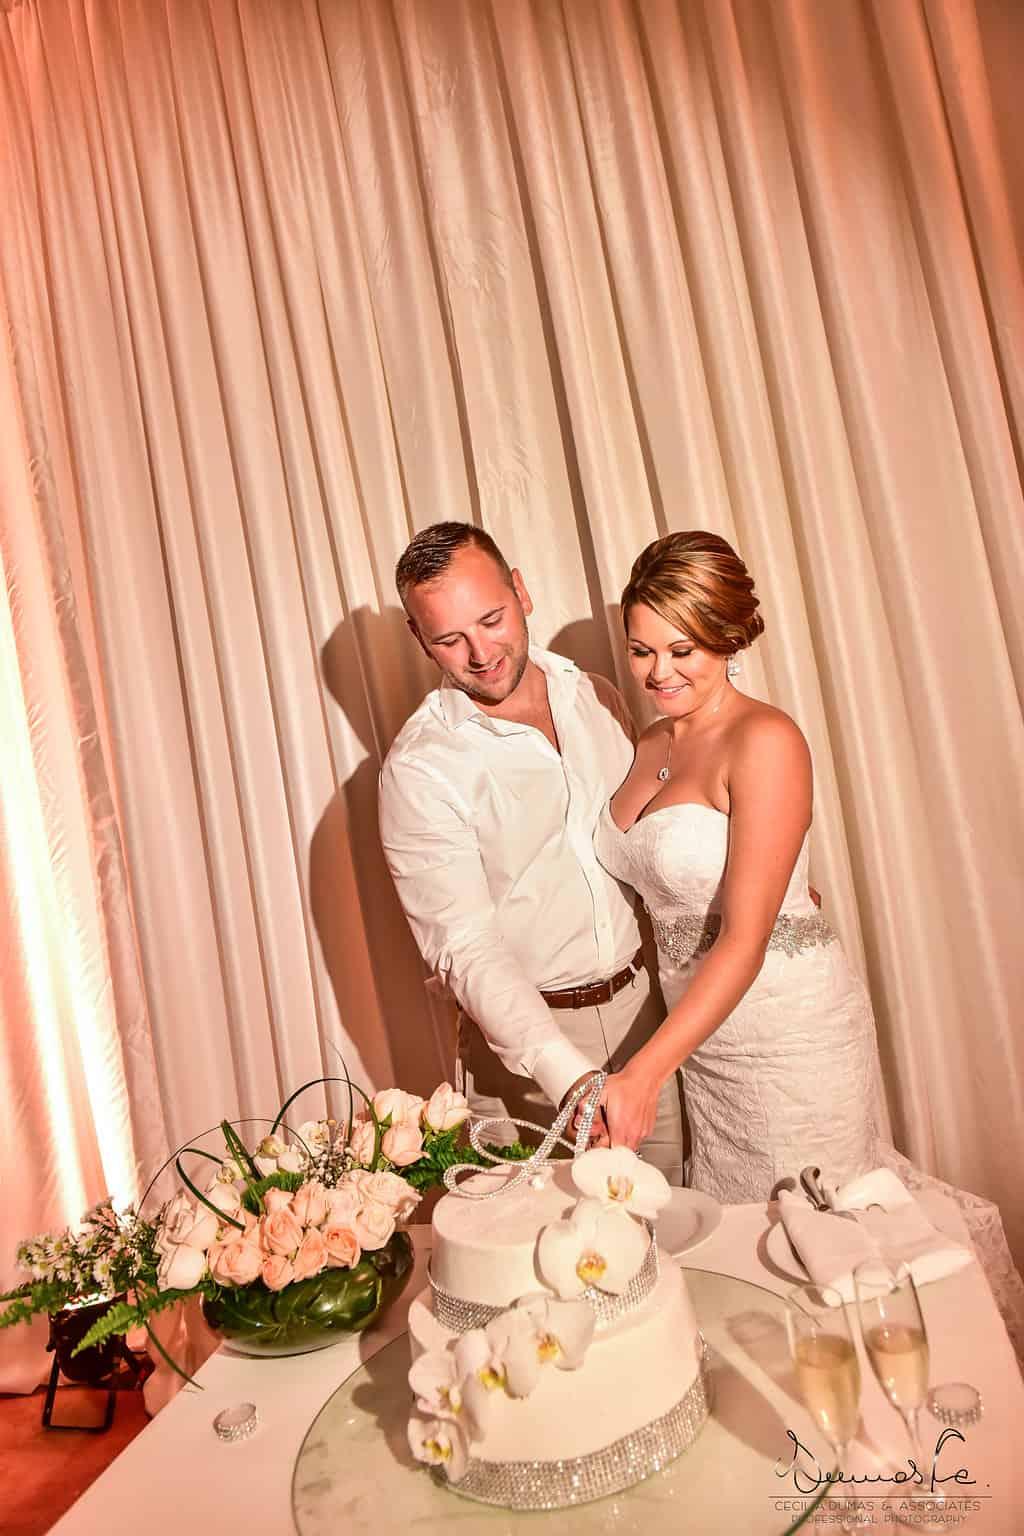 cancun-moonpalacehotel-weddingphotography111